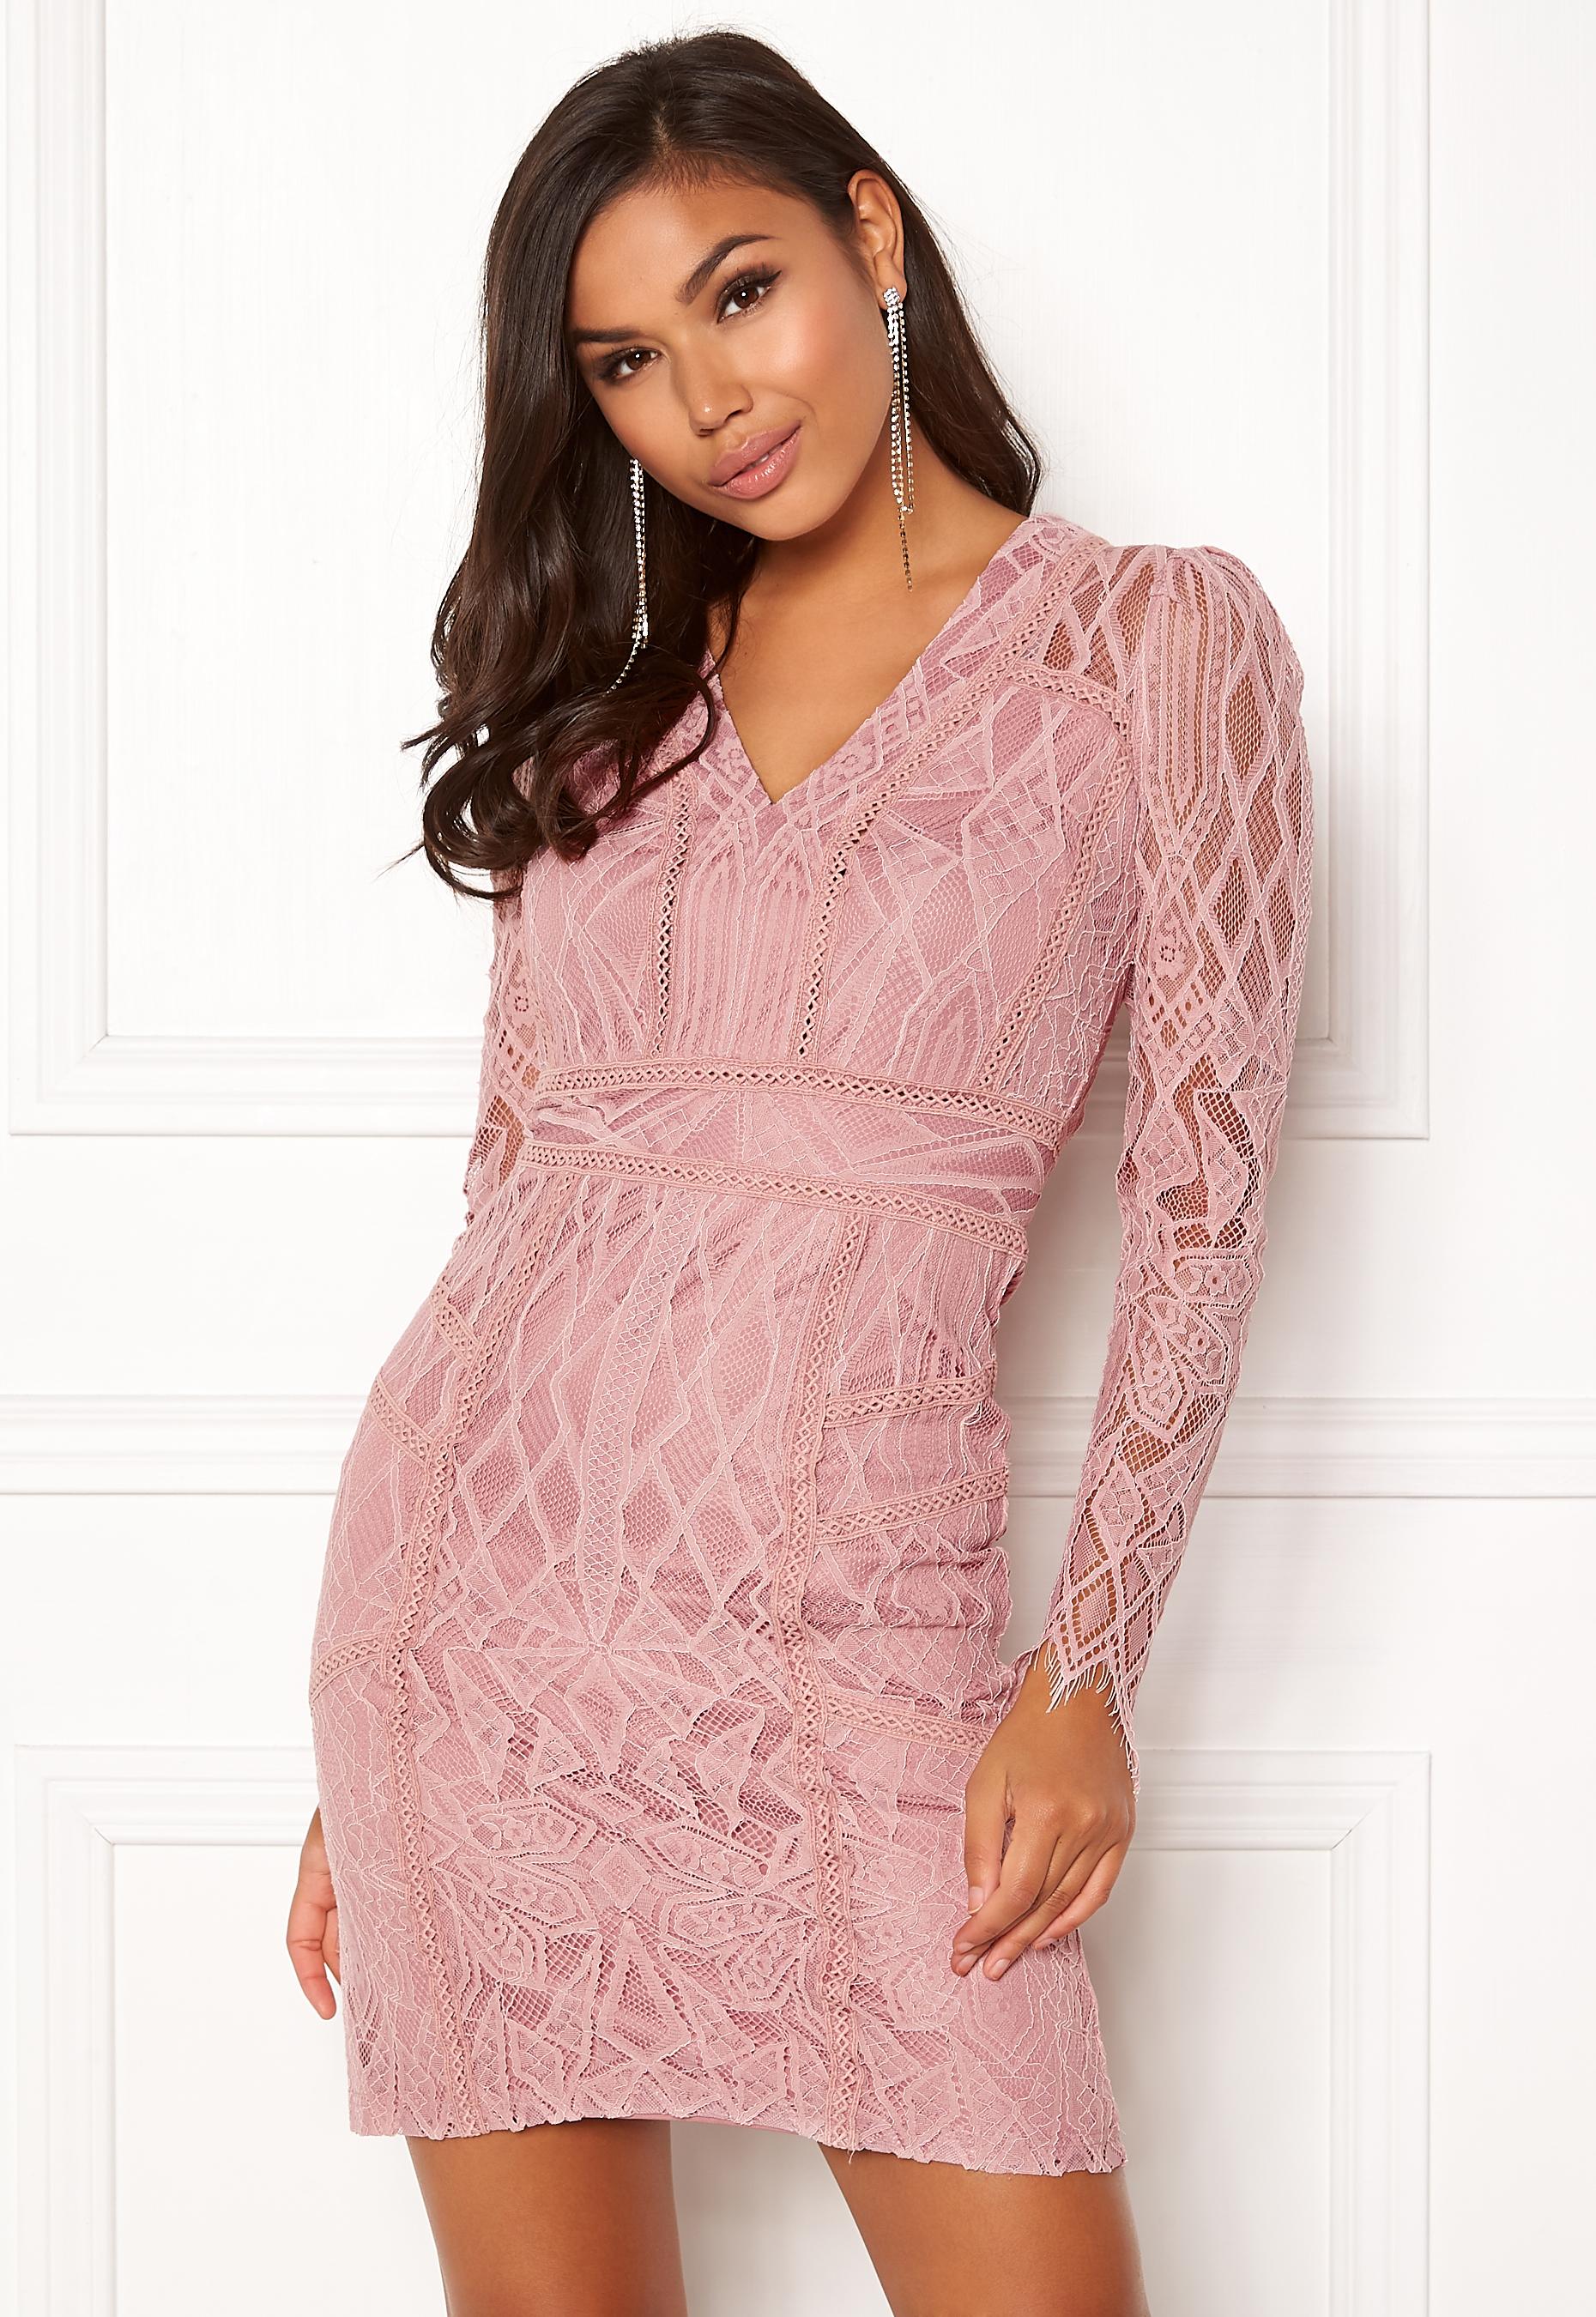 DRY LAKE Miranda Dress Misty Rose - Bubbleroom 7c5b6ab3c462f